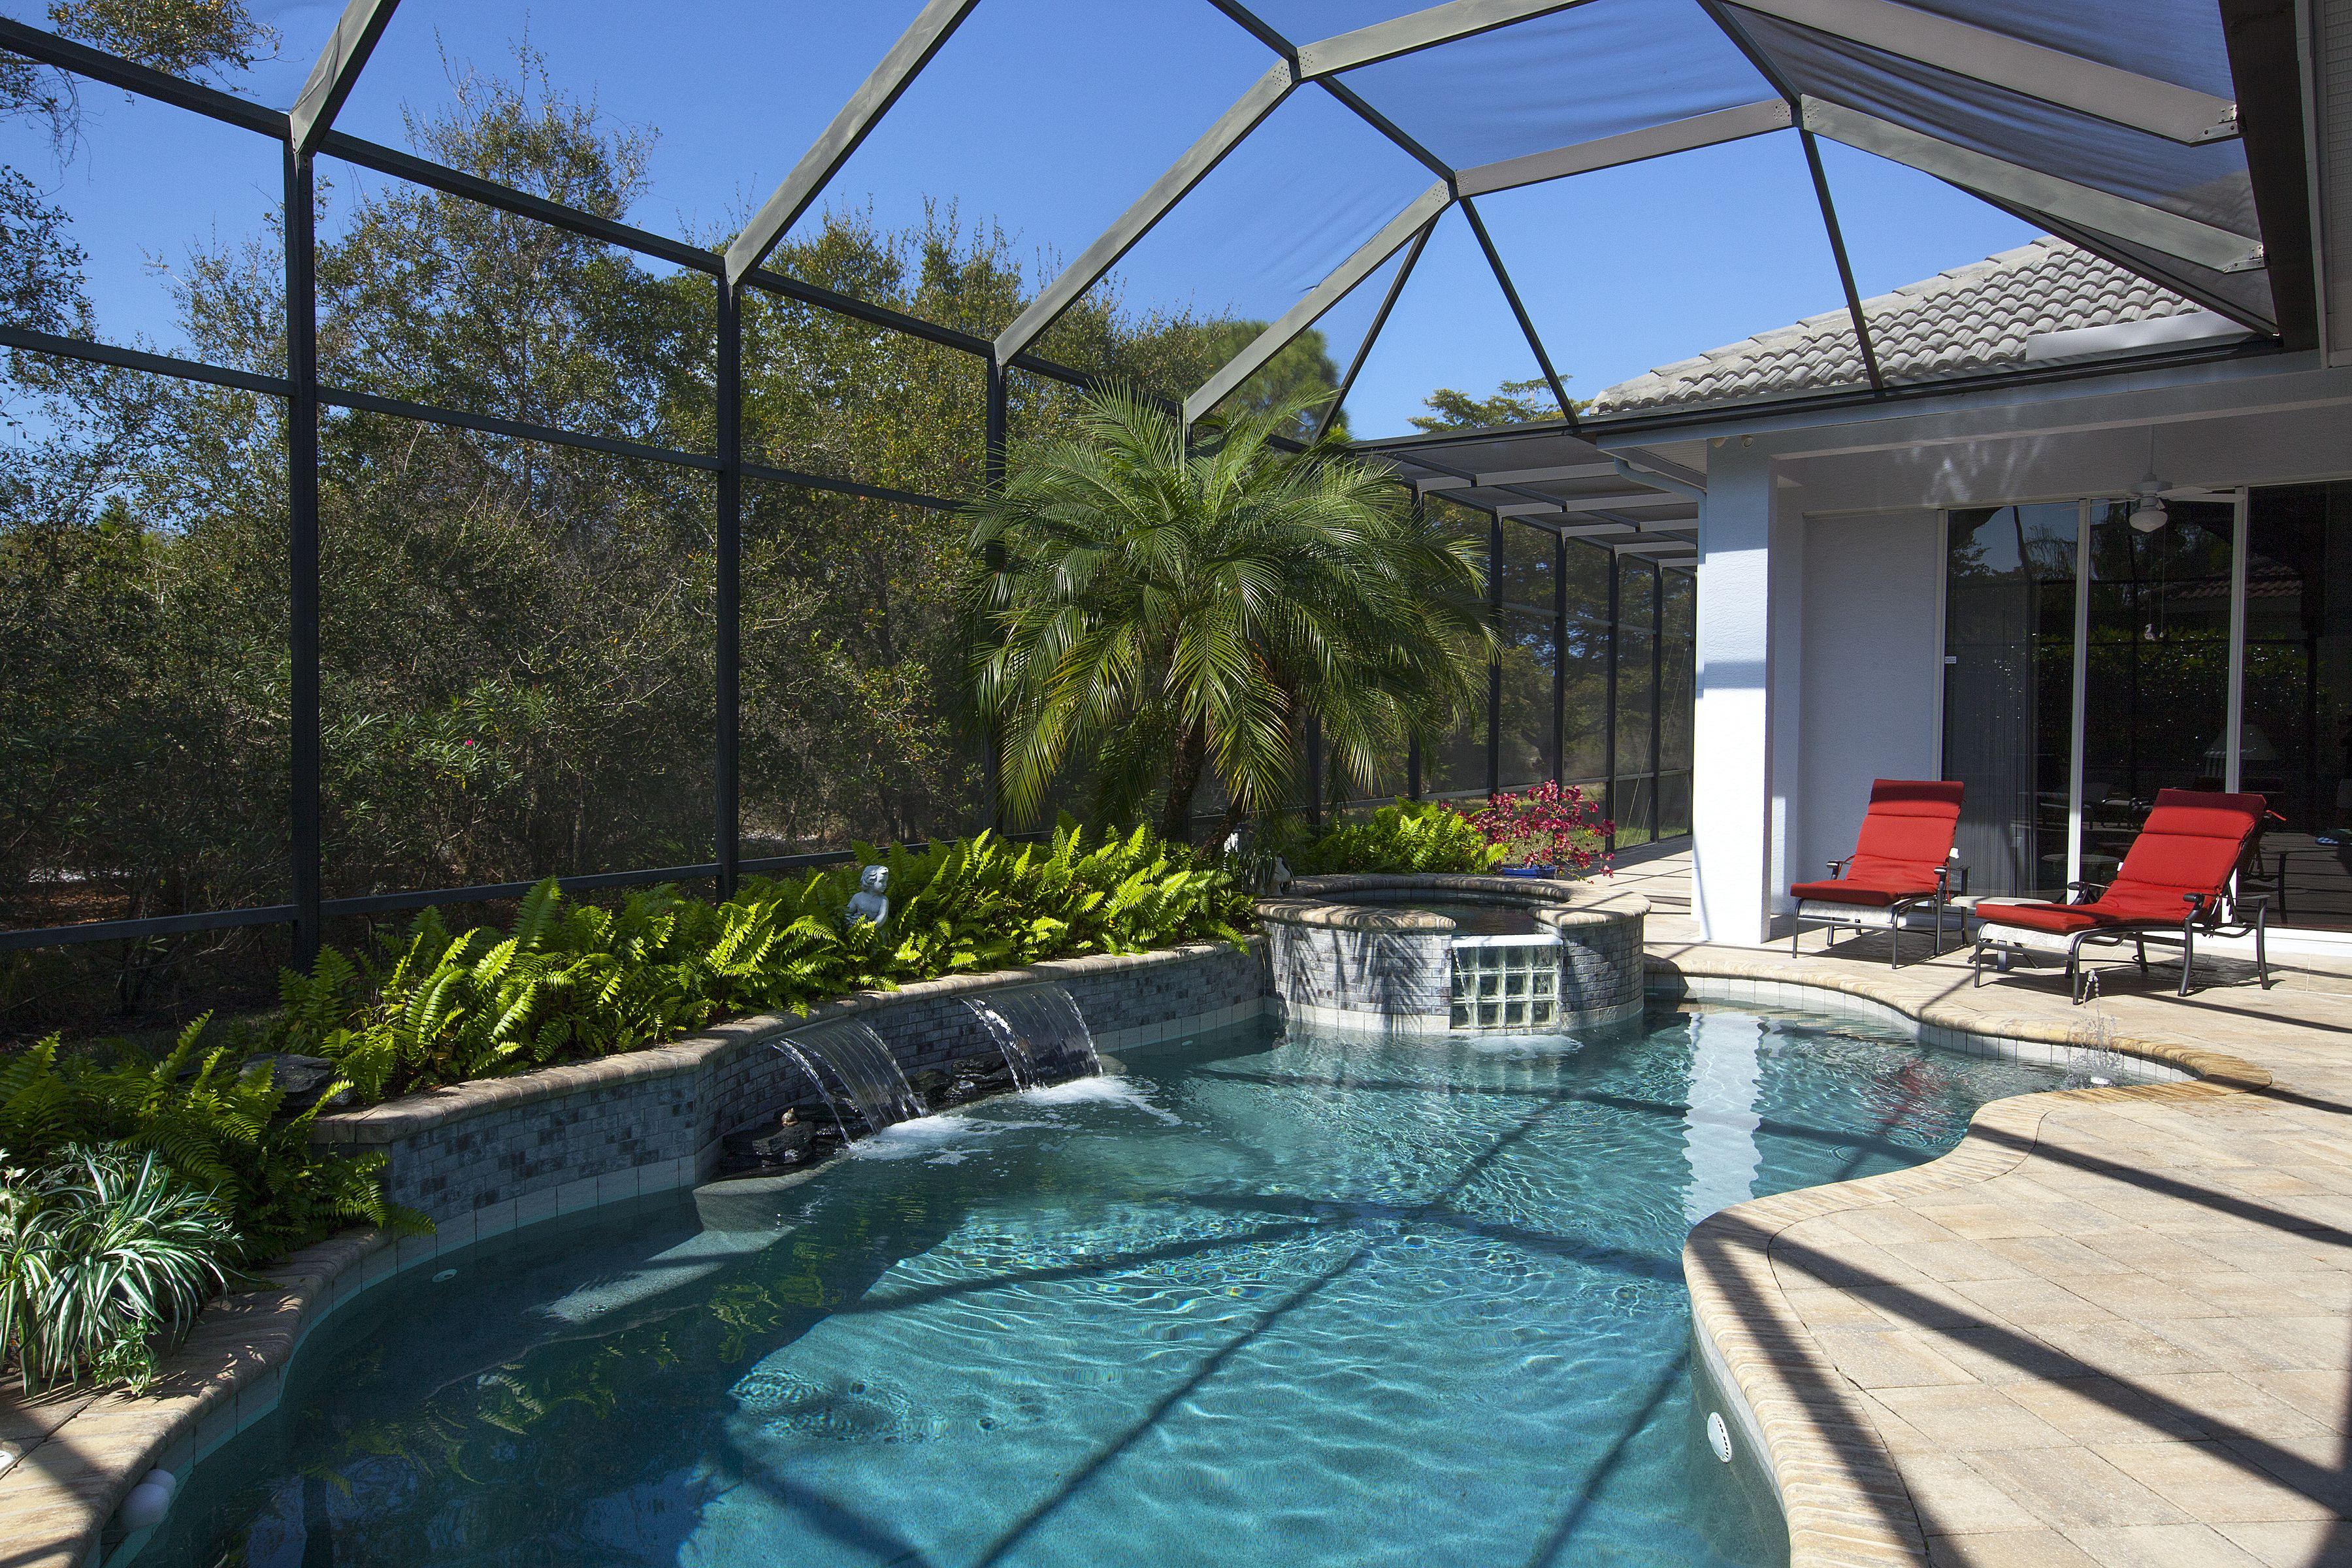 Estero Florida West Bay Club Visit Our Website At Premiersothebysrealty Com For Property Details And Add Florida Real Estate Luxury Real Estate Real Estate